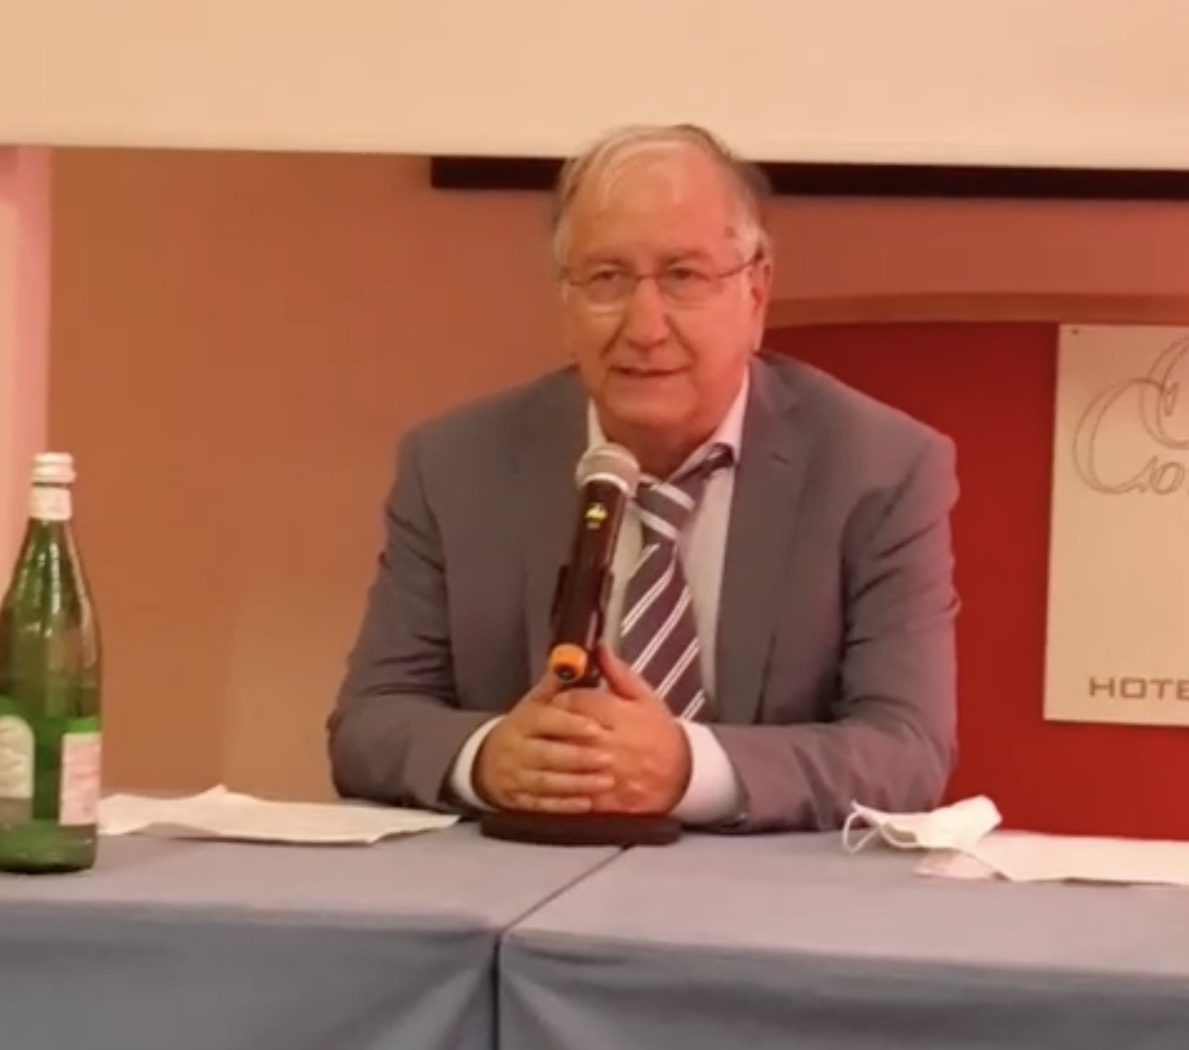 Maurizio Galardo, ex vice Sindaco di Latina nella Giunta Zaccheo